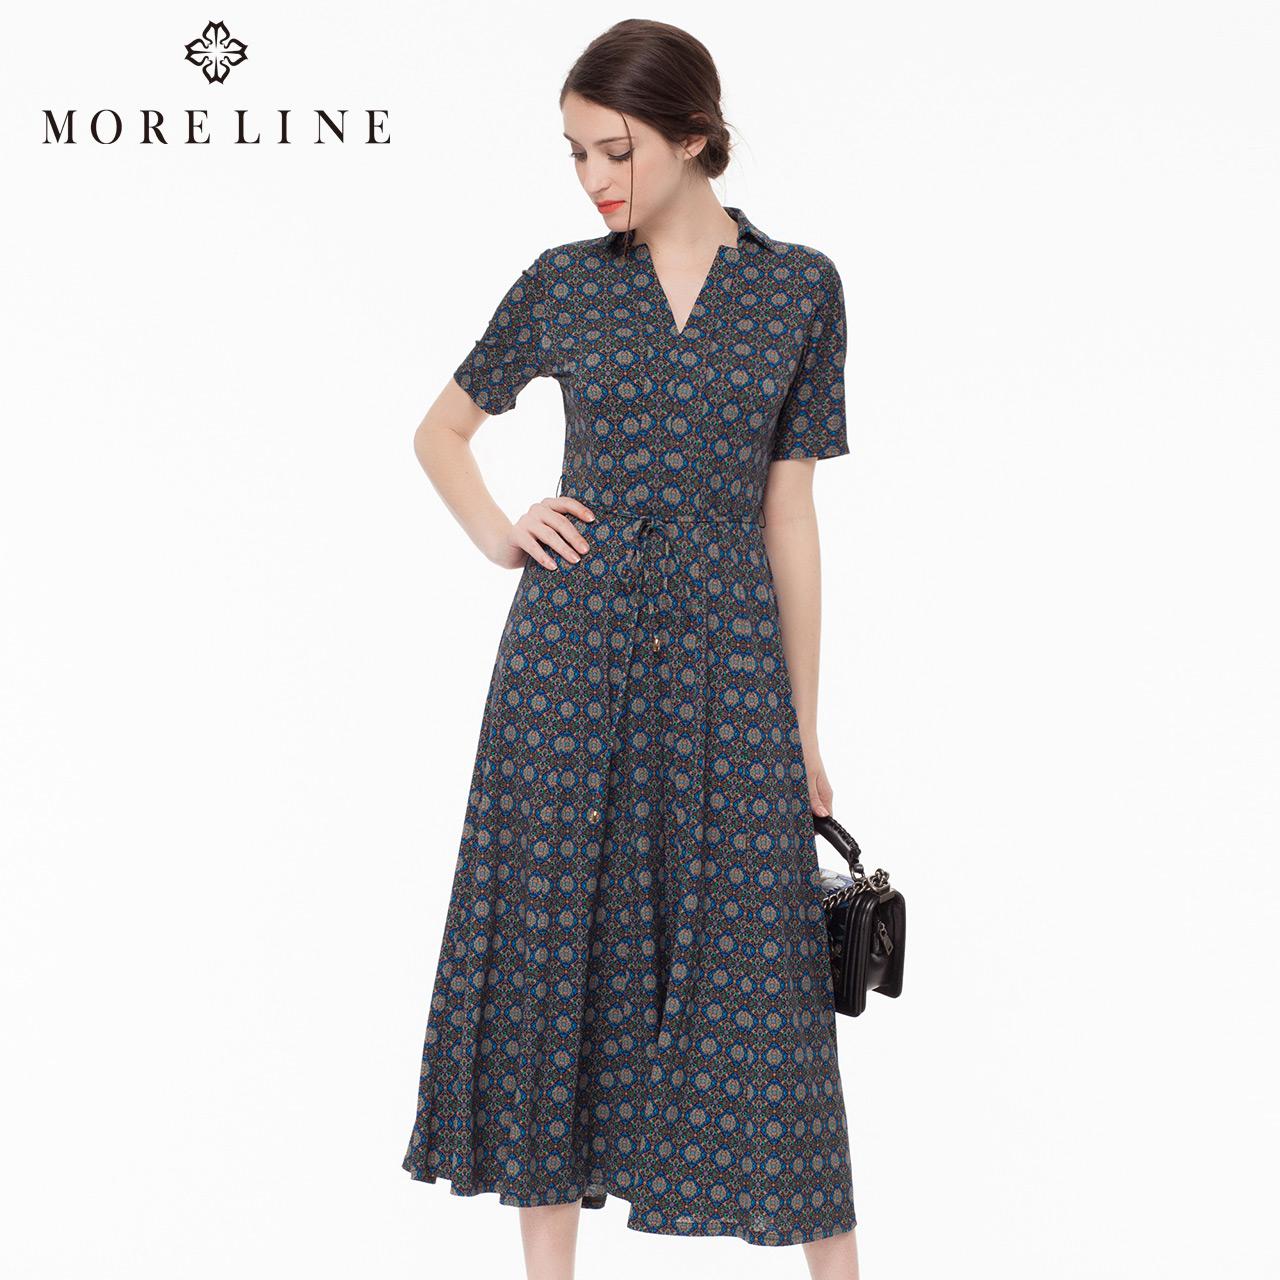 MORELINE沐兰夏季时尚气质名媛熟女v领短袖针织碎花连衣裙1322413